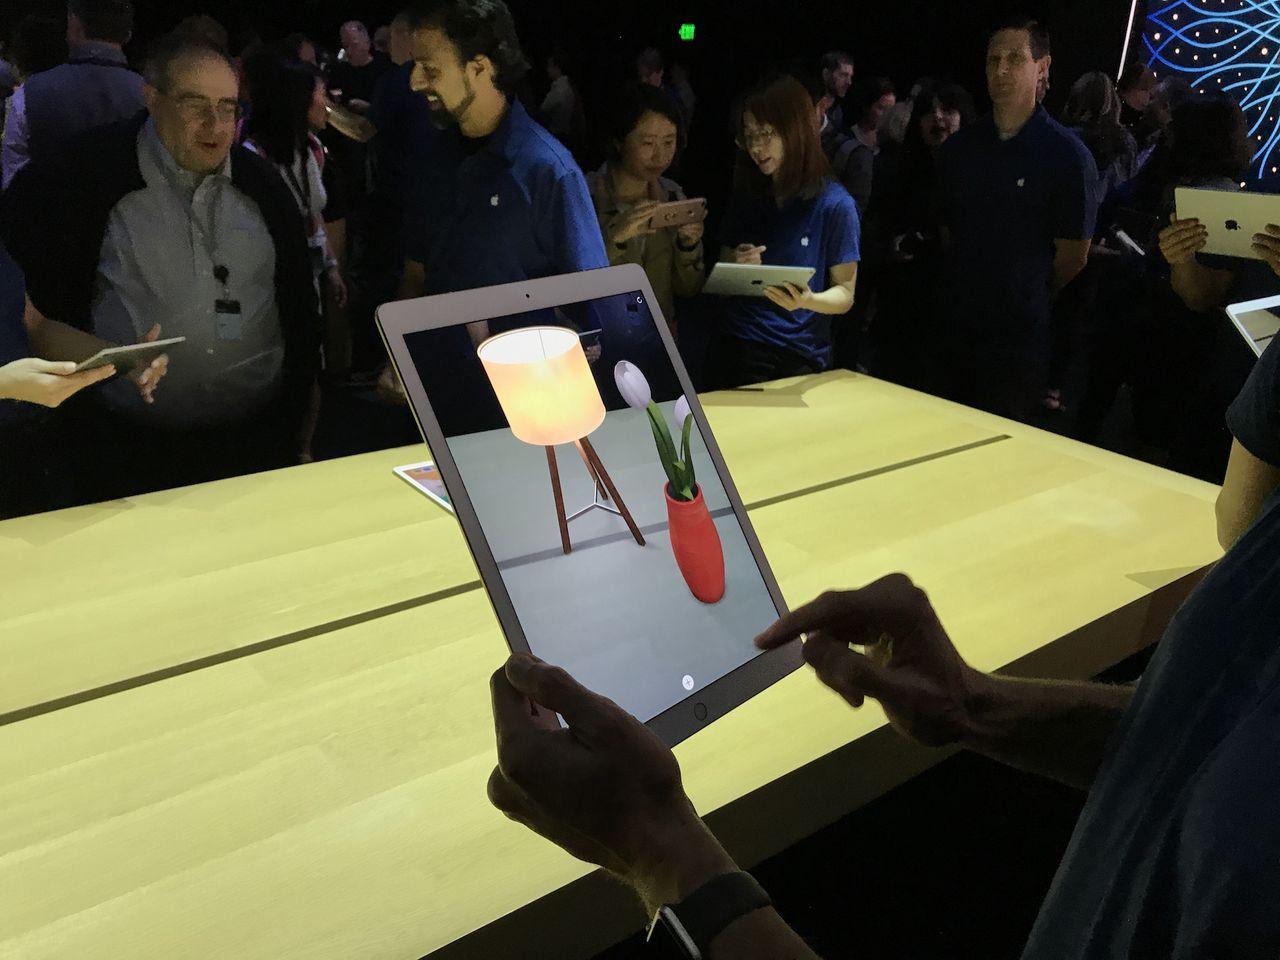 Apple visar upp ARKit